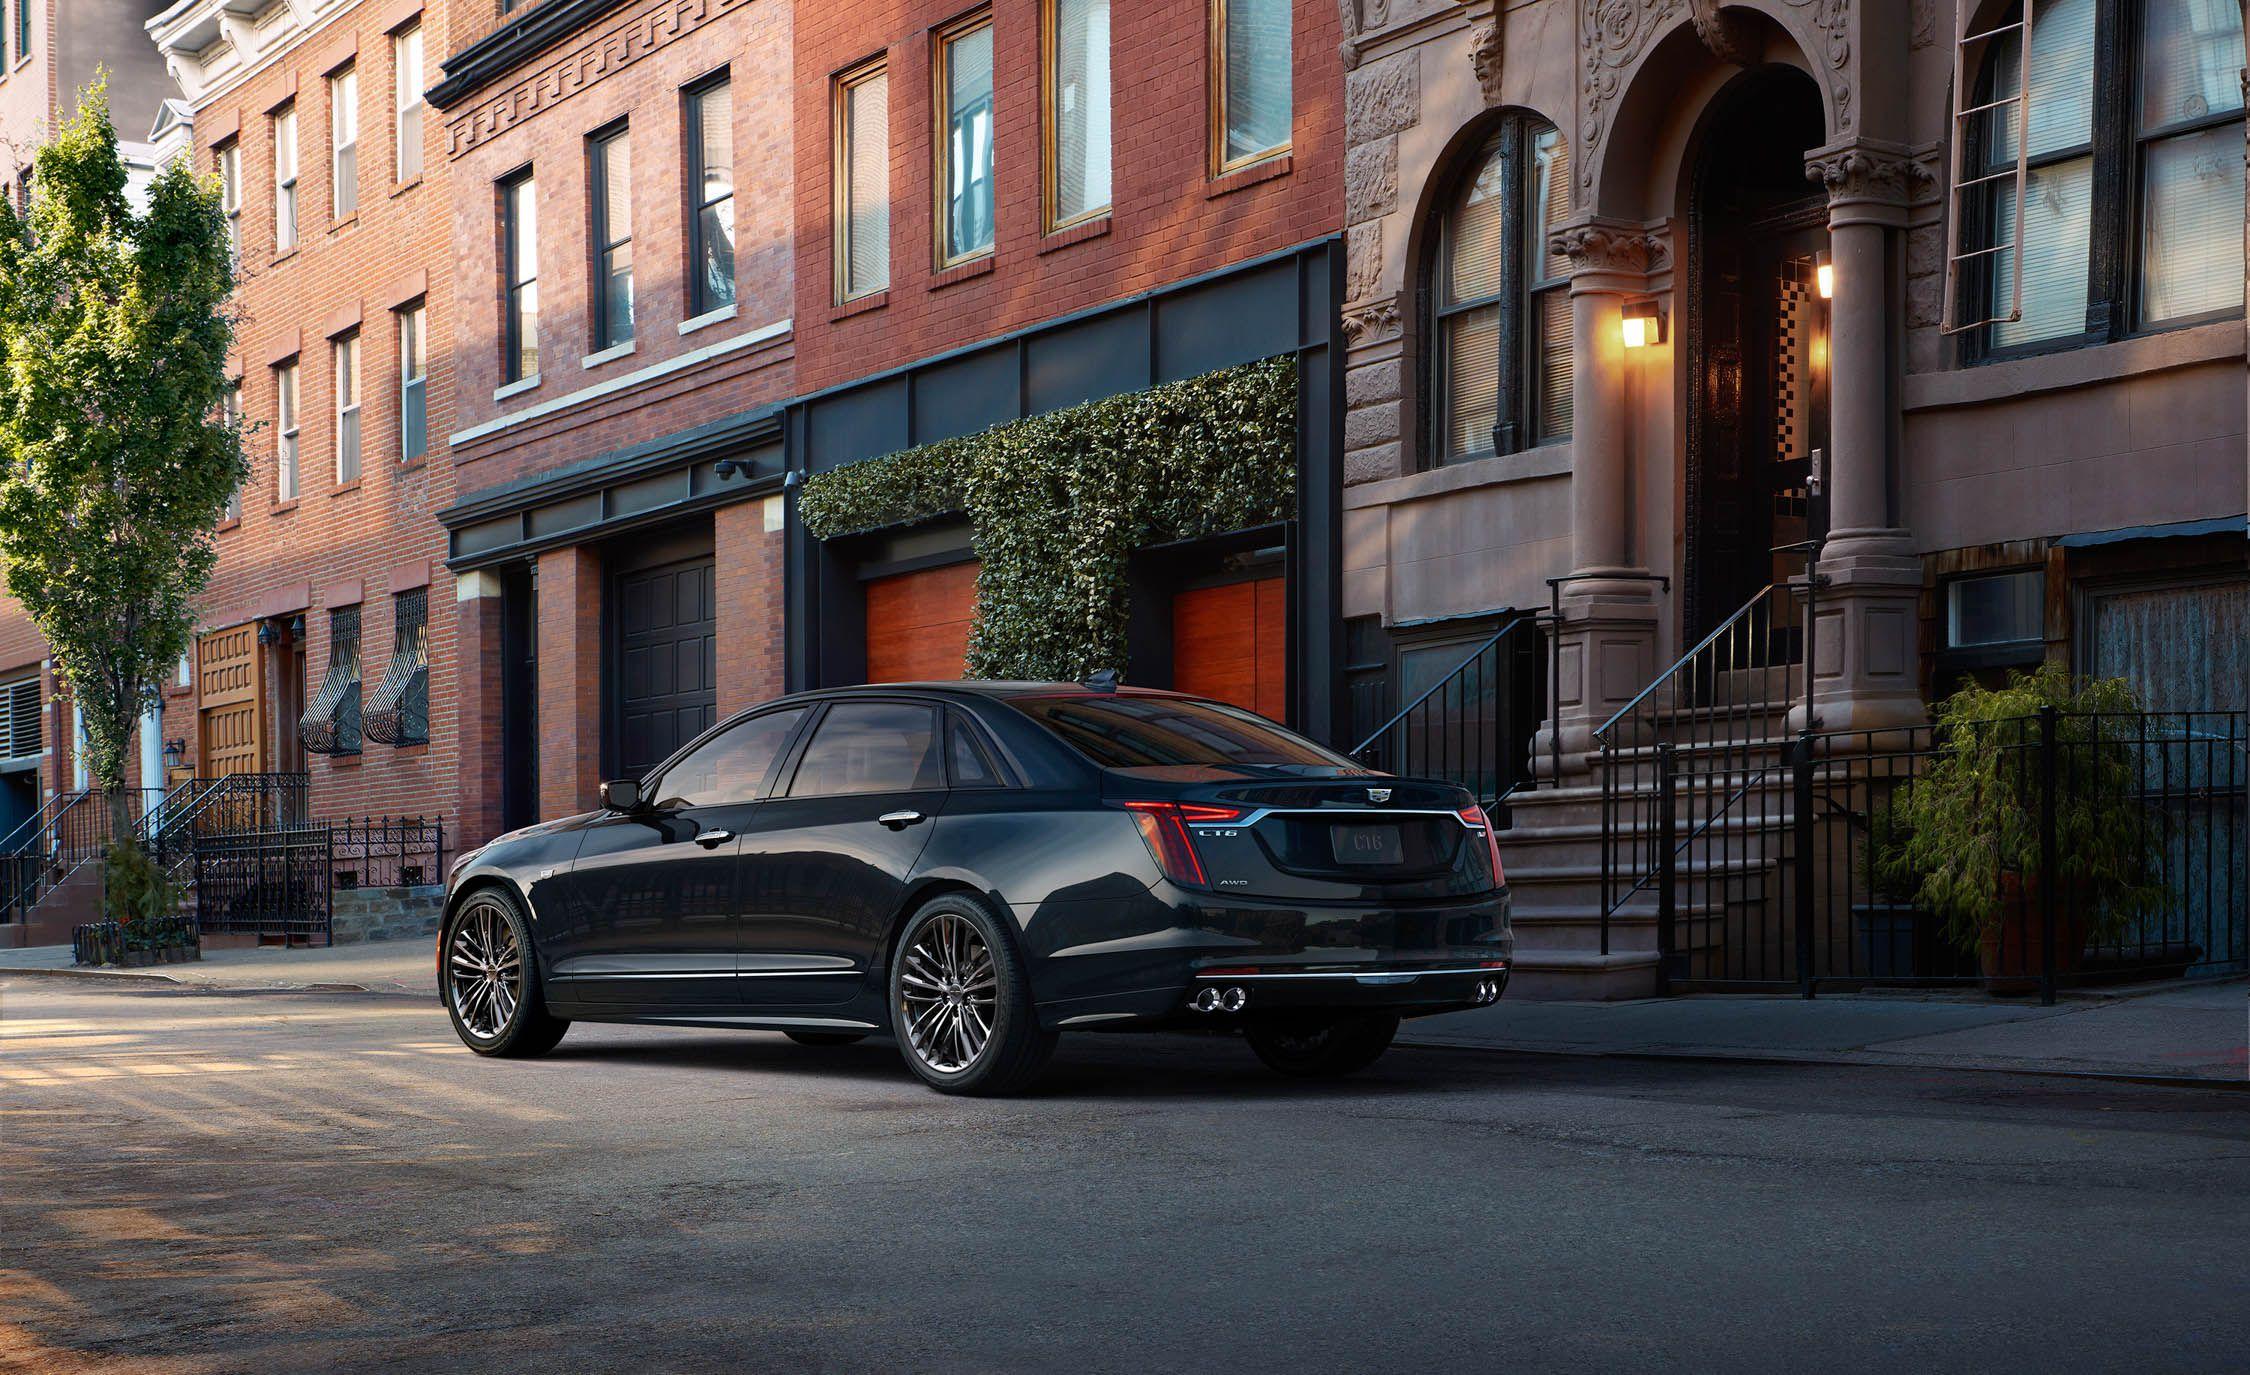 2019 Cadillac CT6 V-Sport Rear Three-Quarter Wallpapers (4)